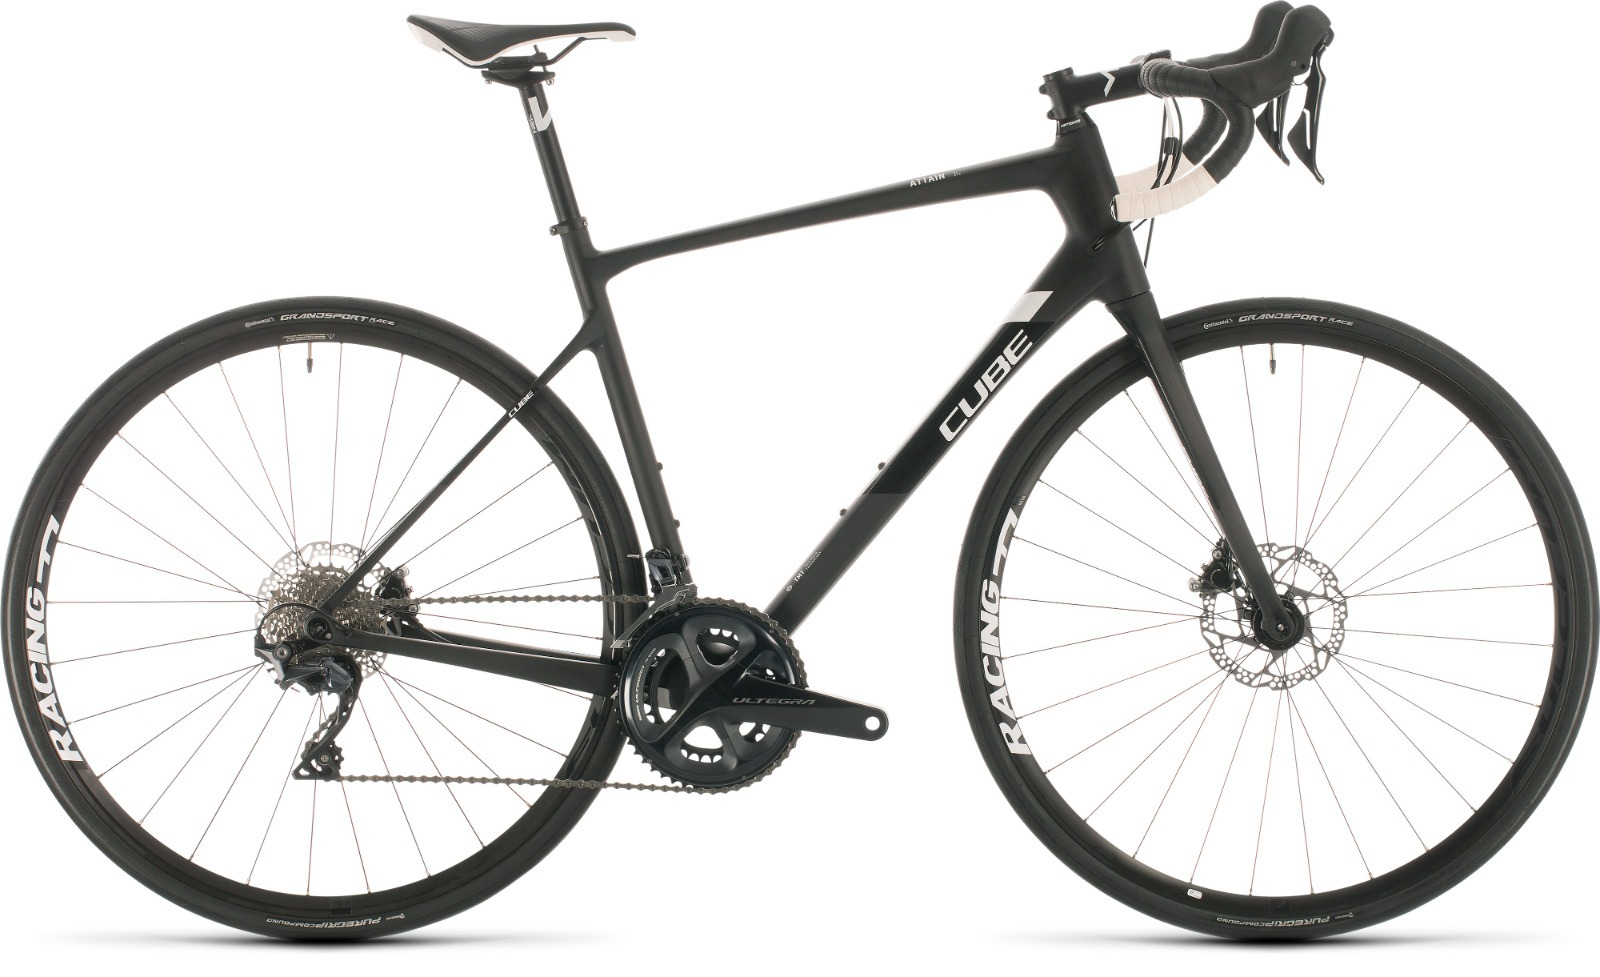 Bici da Corsa Attain GTC SL carbon - Noleggio Bici Canazei